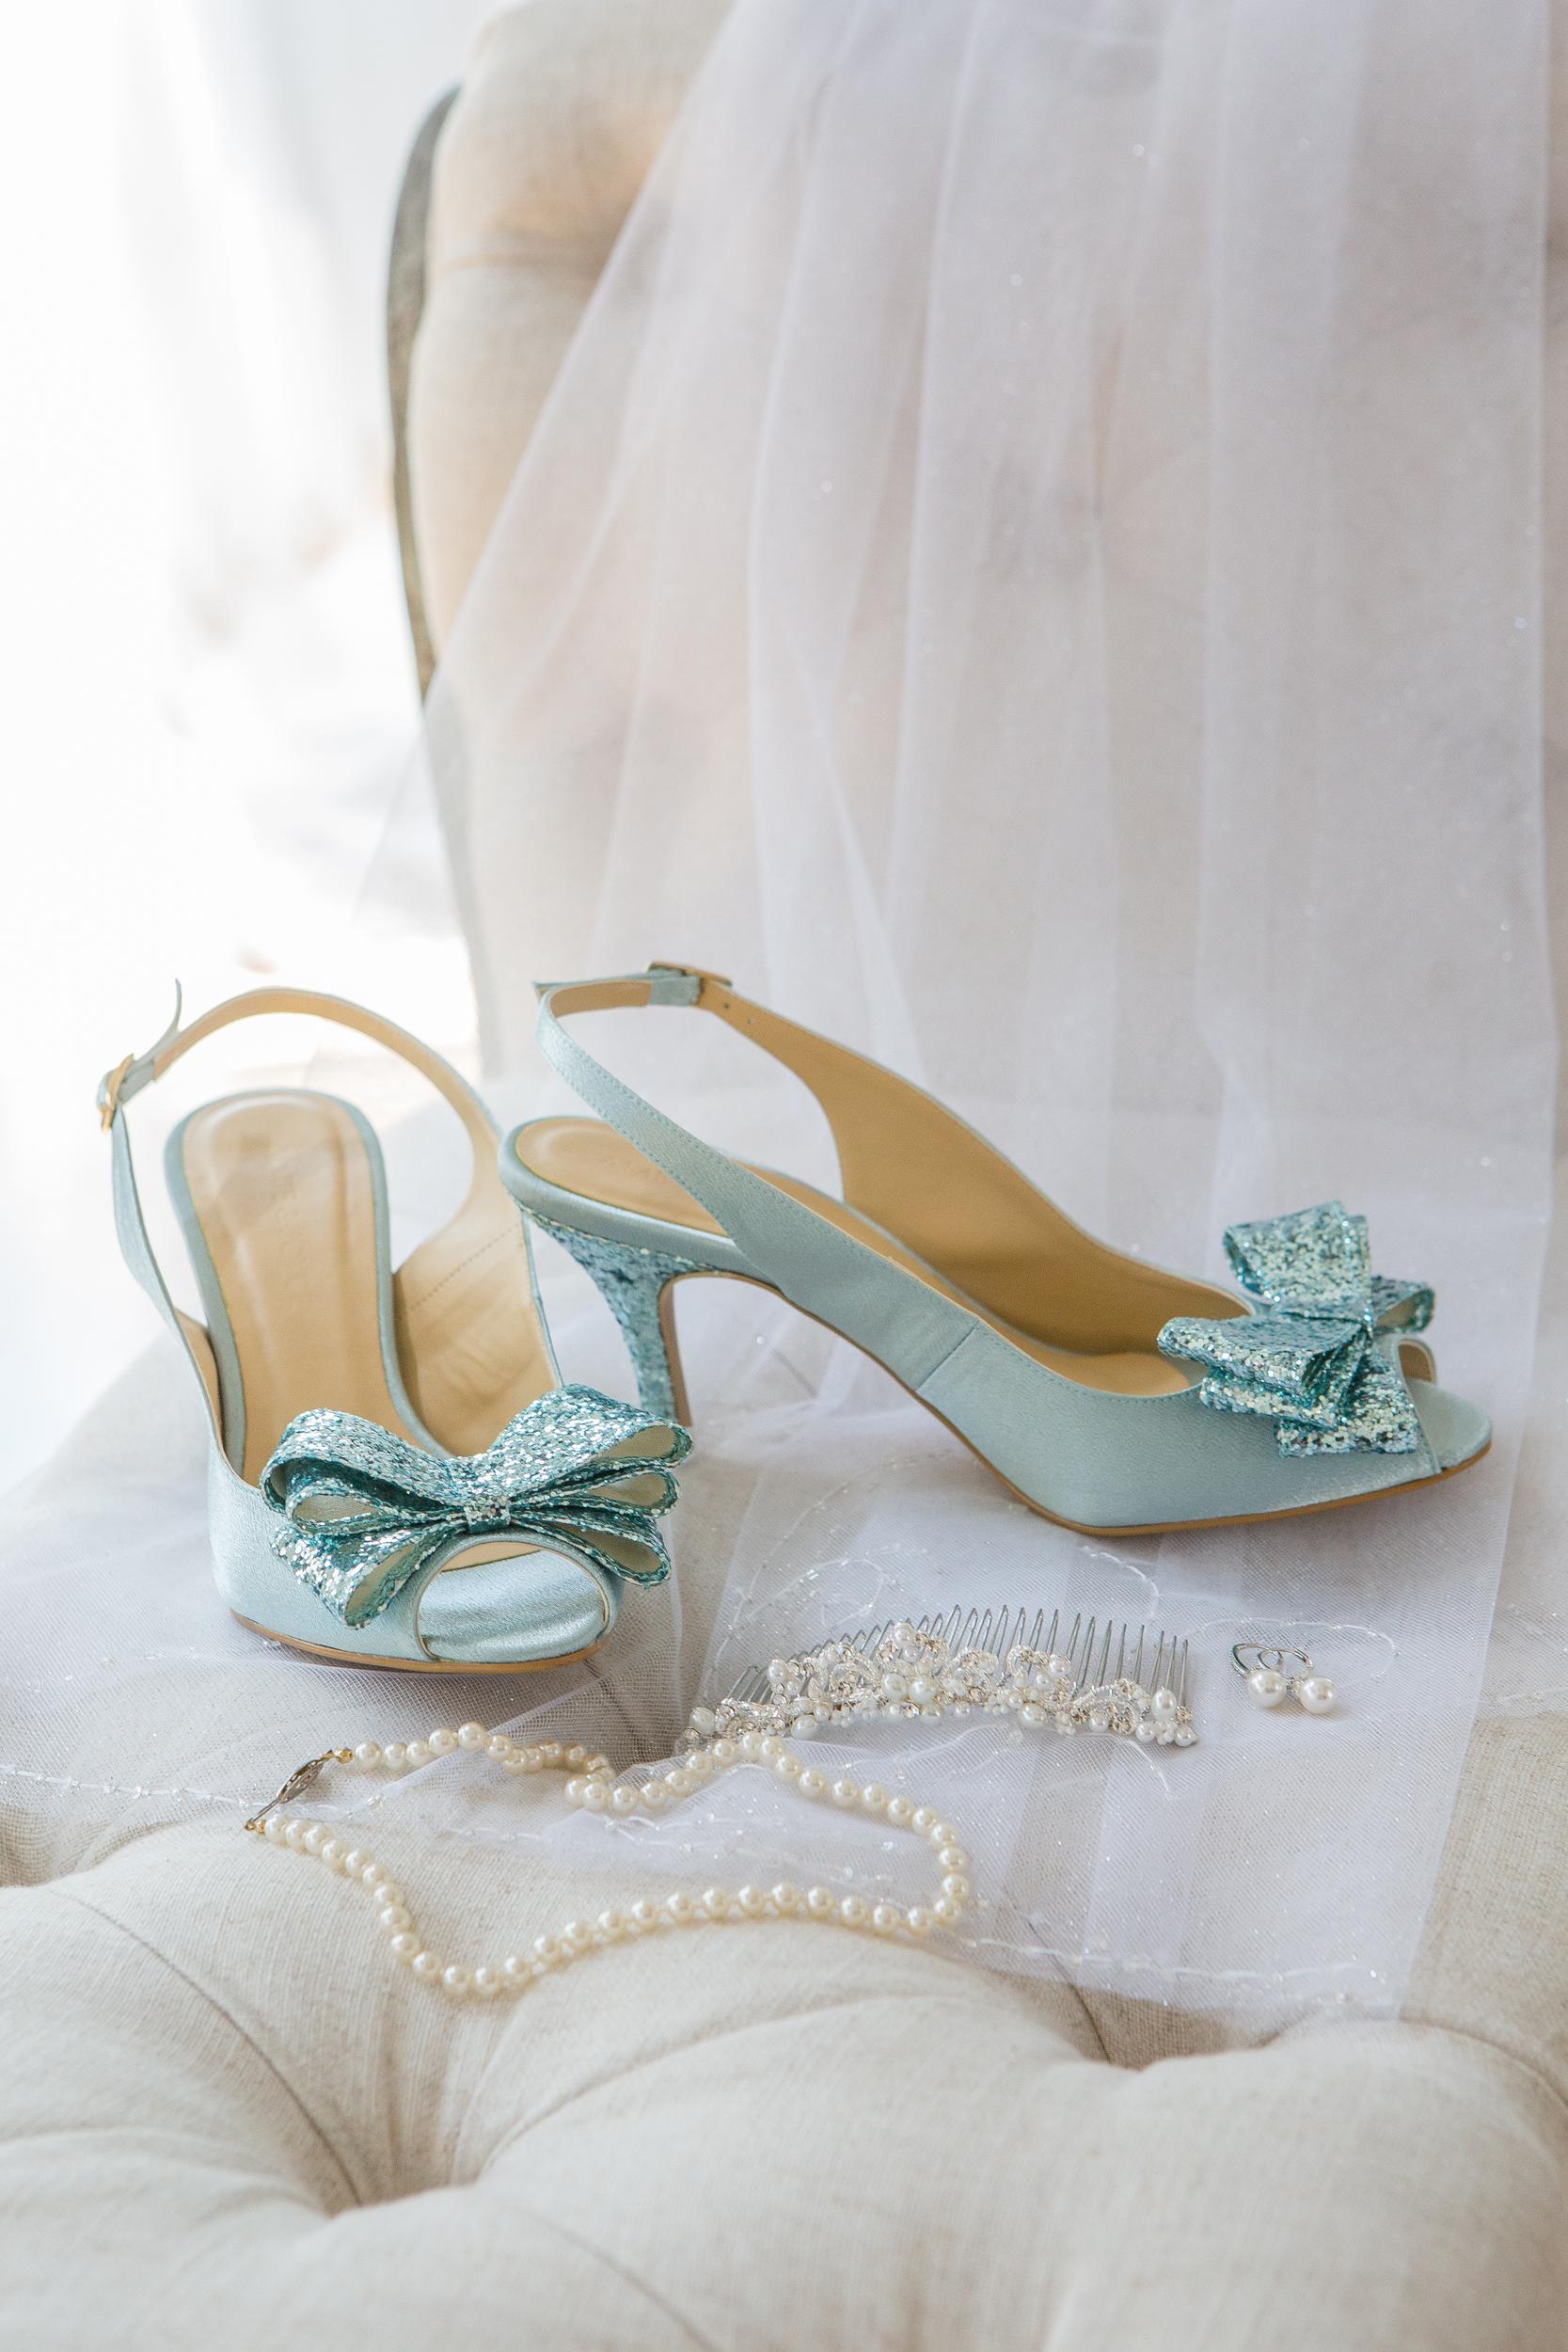 Rochester Wedding Photography - Bridal Salon